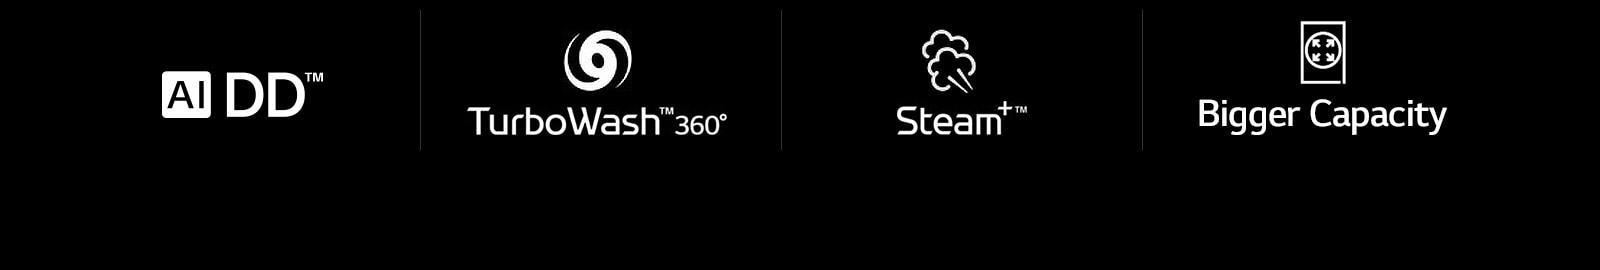 LG F4V9BWP2E 12 kg AI DD™, TurboWash™360˚, Steam+™, Bigger Capacity